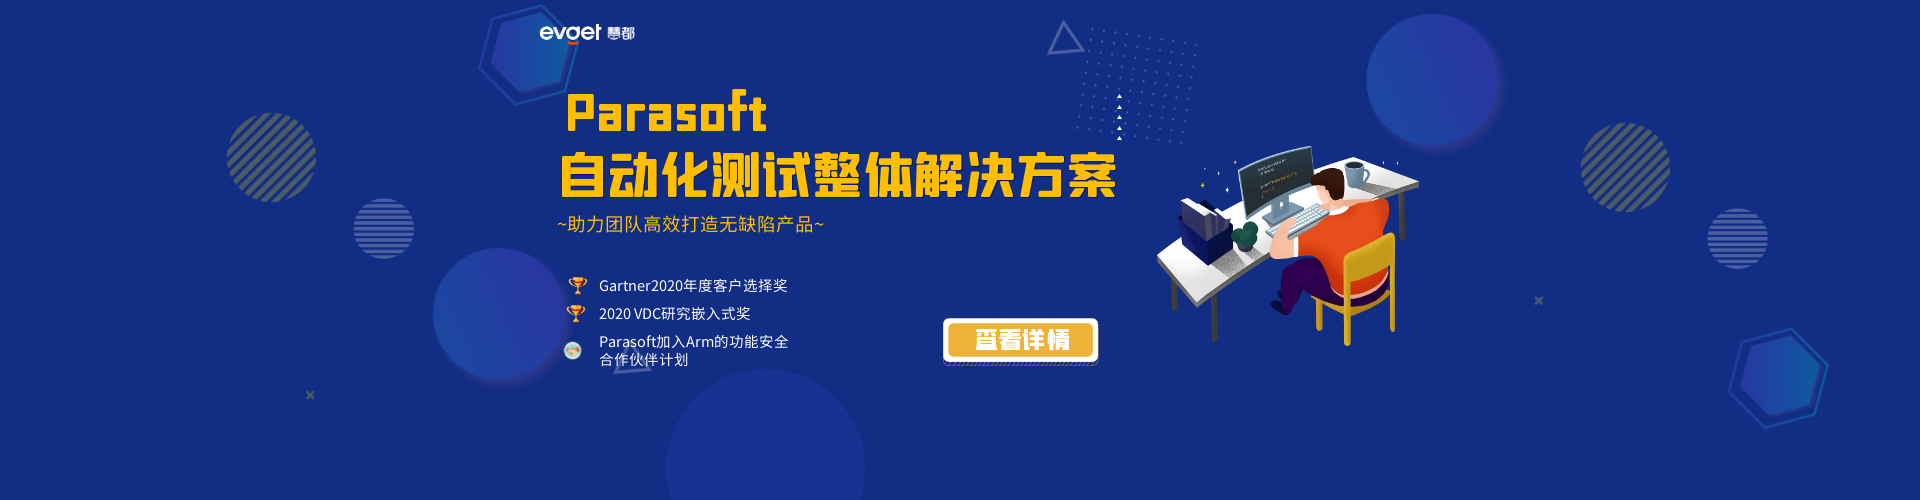 parasoft专题页宣传